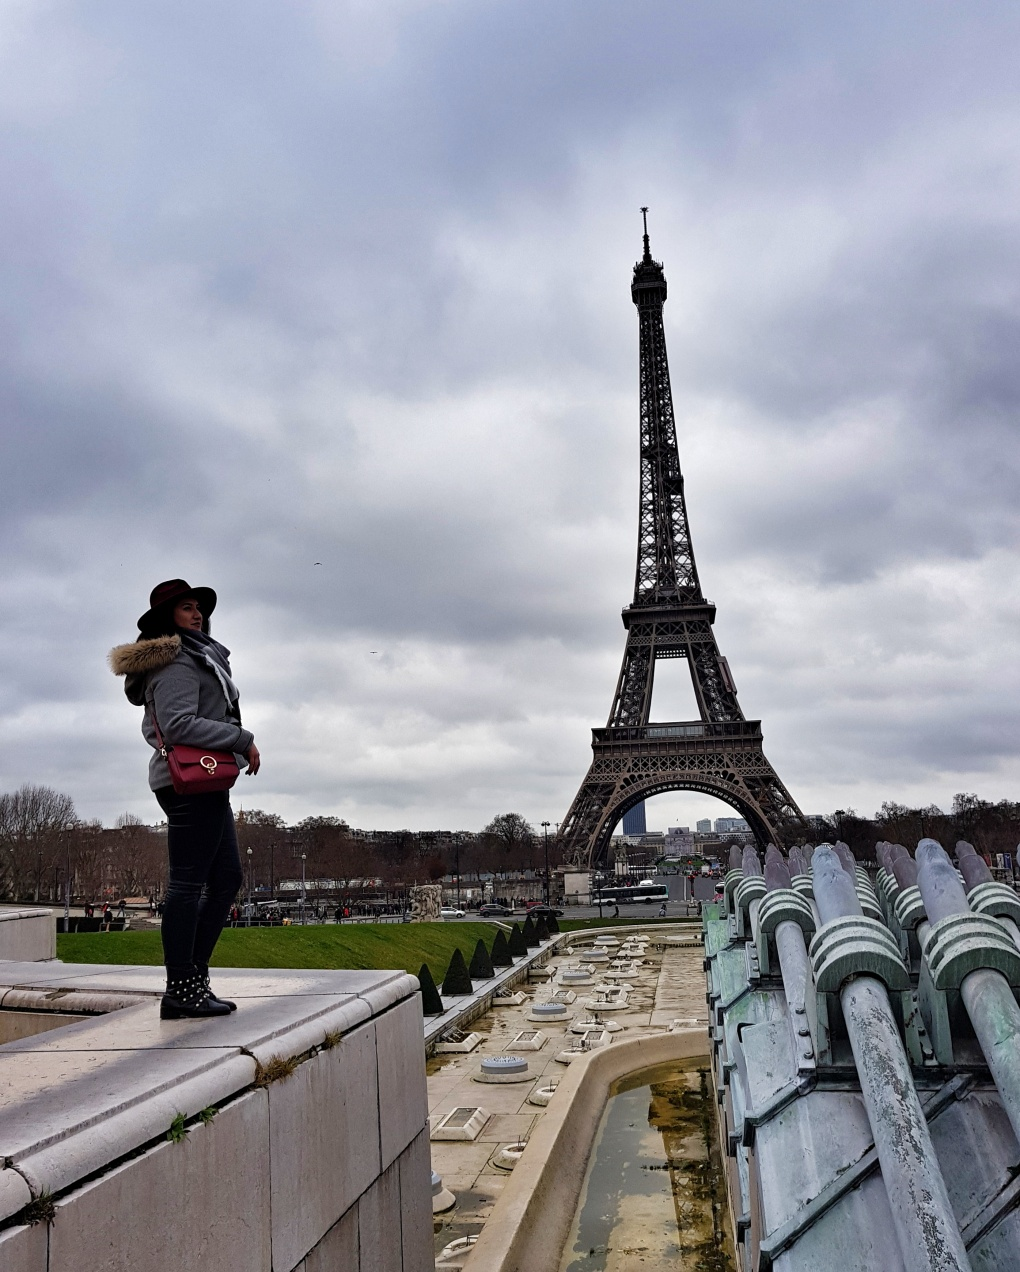 eiffel_tower_trocadero_paris